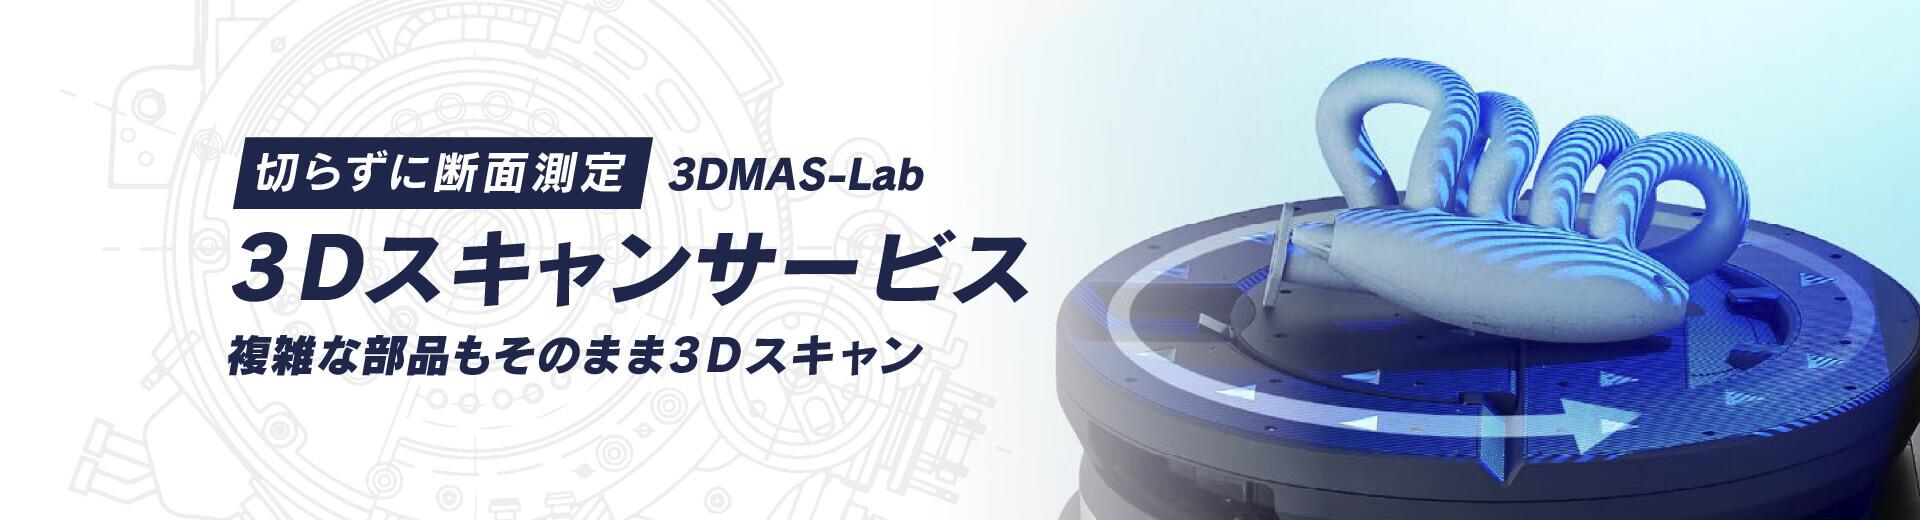 3Dスキャン+測定サービス 3DMAS-Lab 複雑な部品もそのままスキャン 株式会社マスナガ